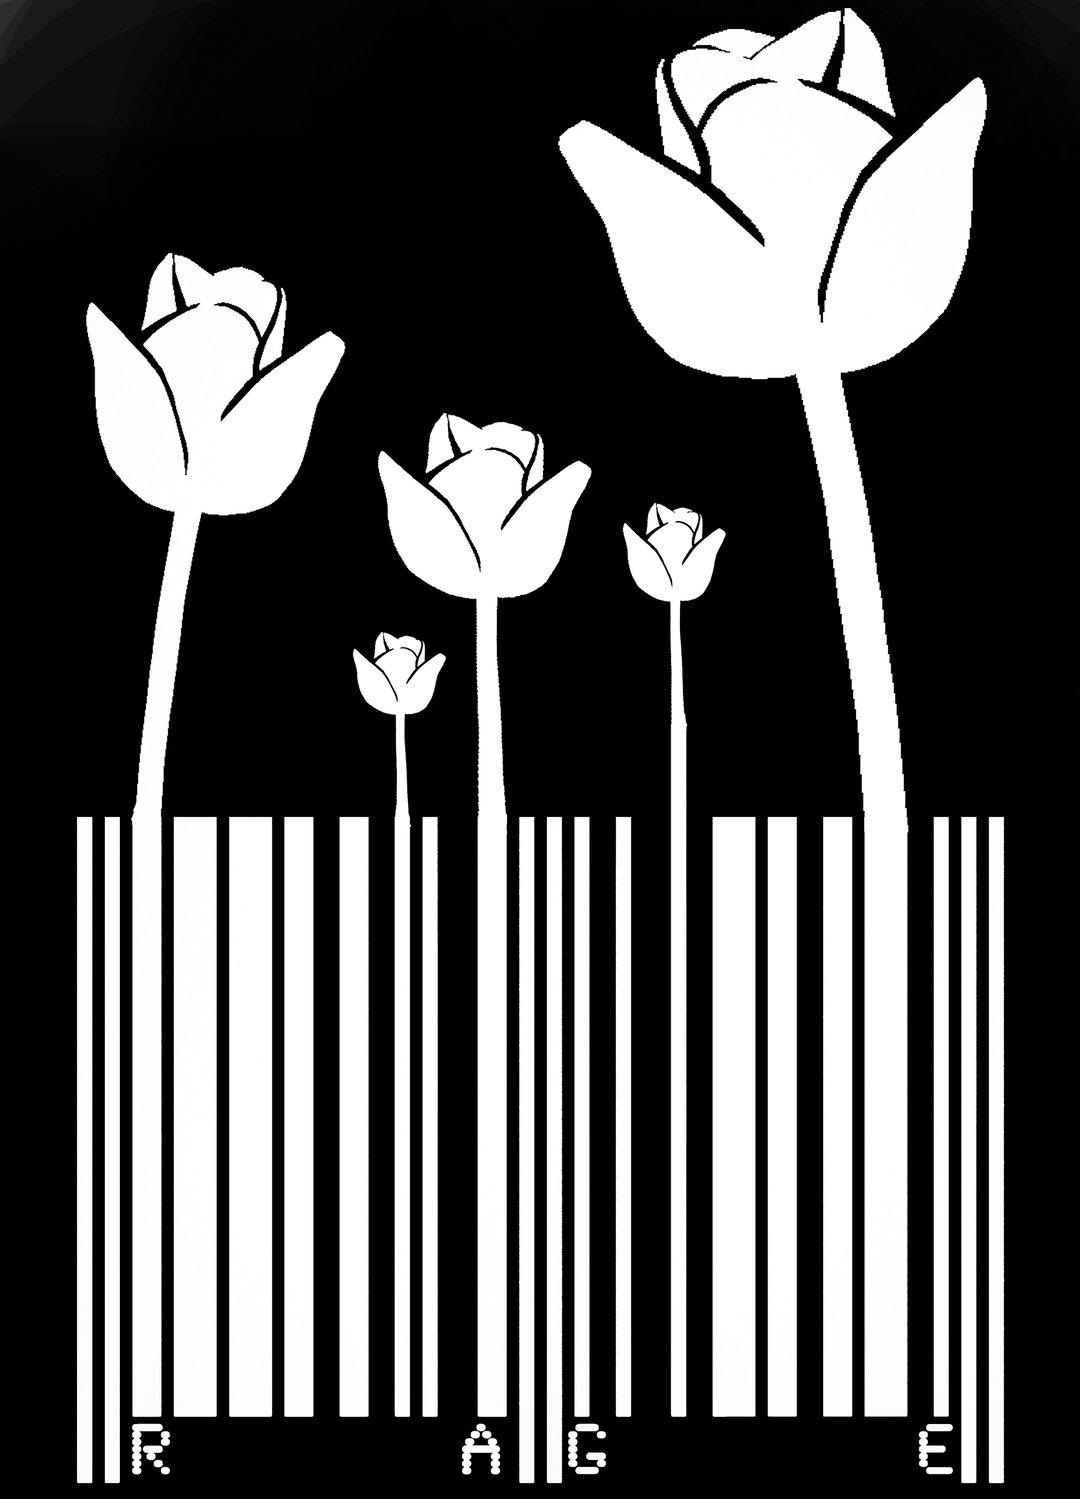 Barcode flower